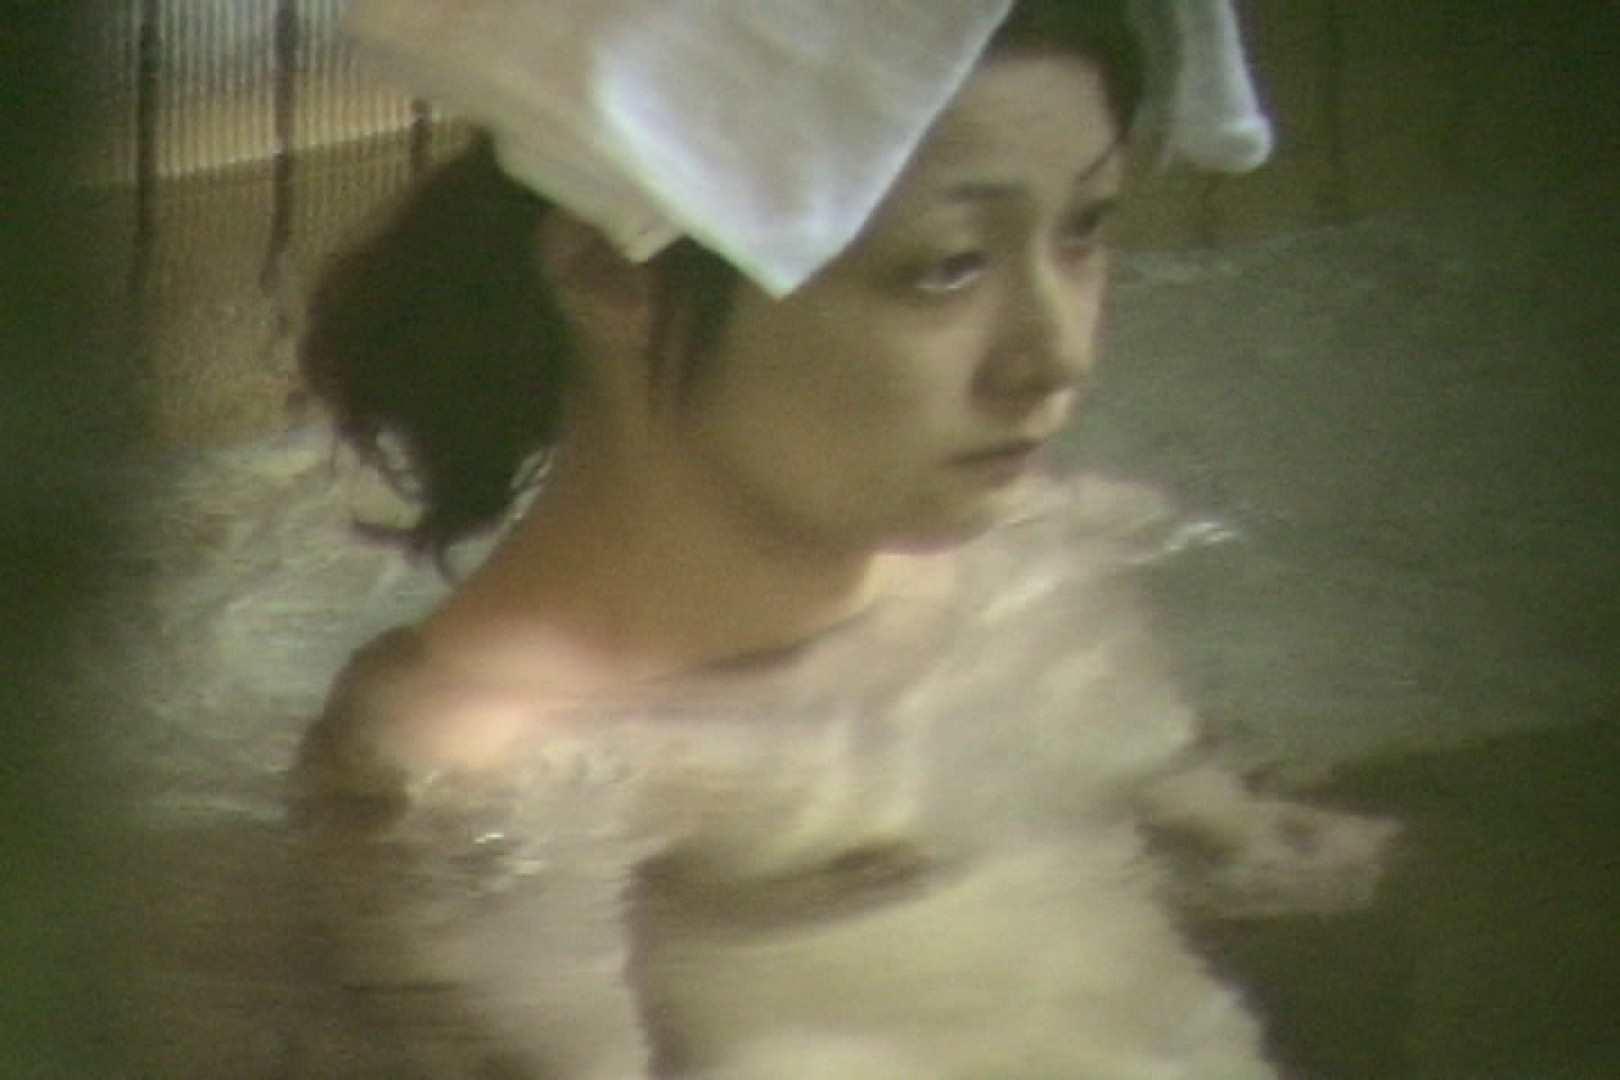 Aquaな露天風呂Vol.701 露天風呂突入 おめこ無修正画像 80pic 29